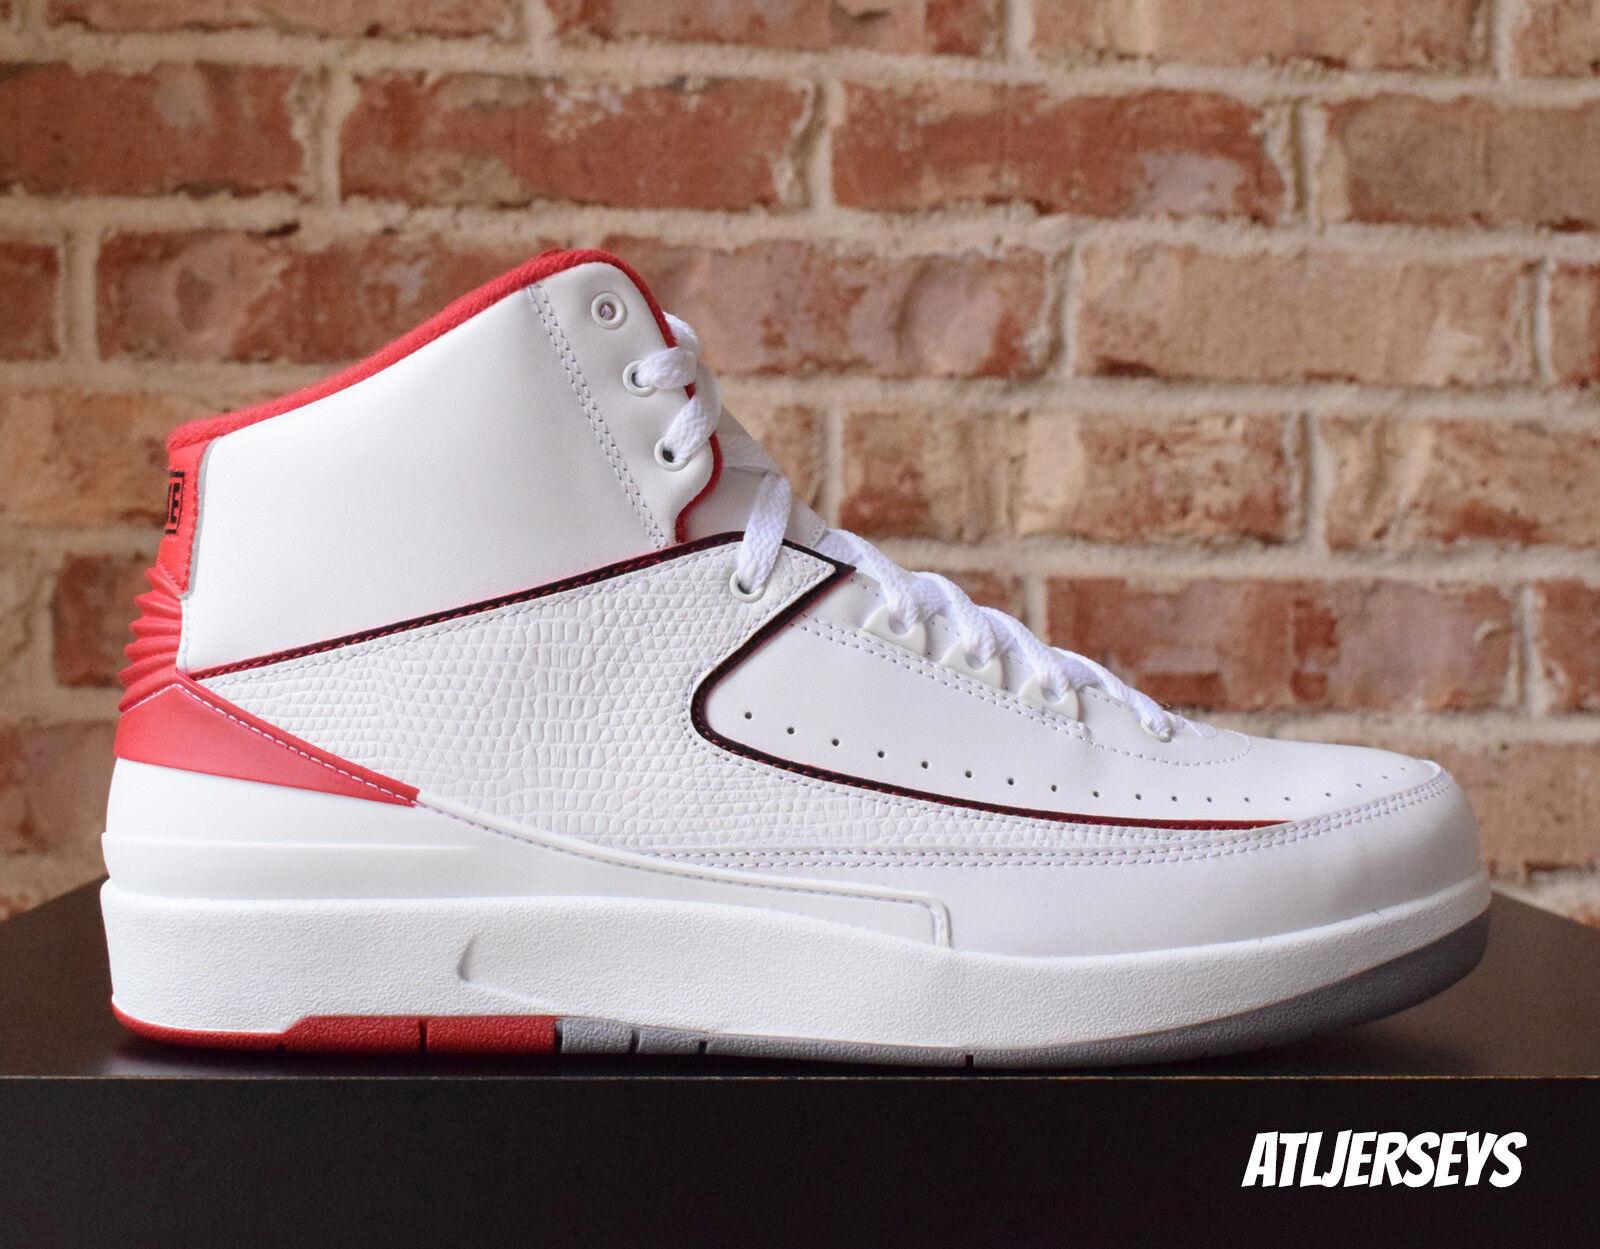 Nike Air Jordan 2 Varsity II Retro White Black Varsity 2 Red Grey 385475-102 Size 8 69d96e